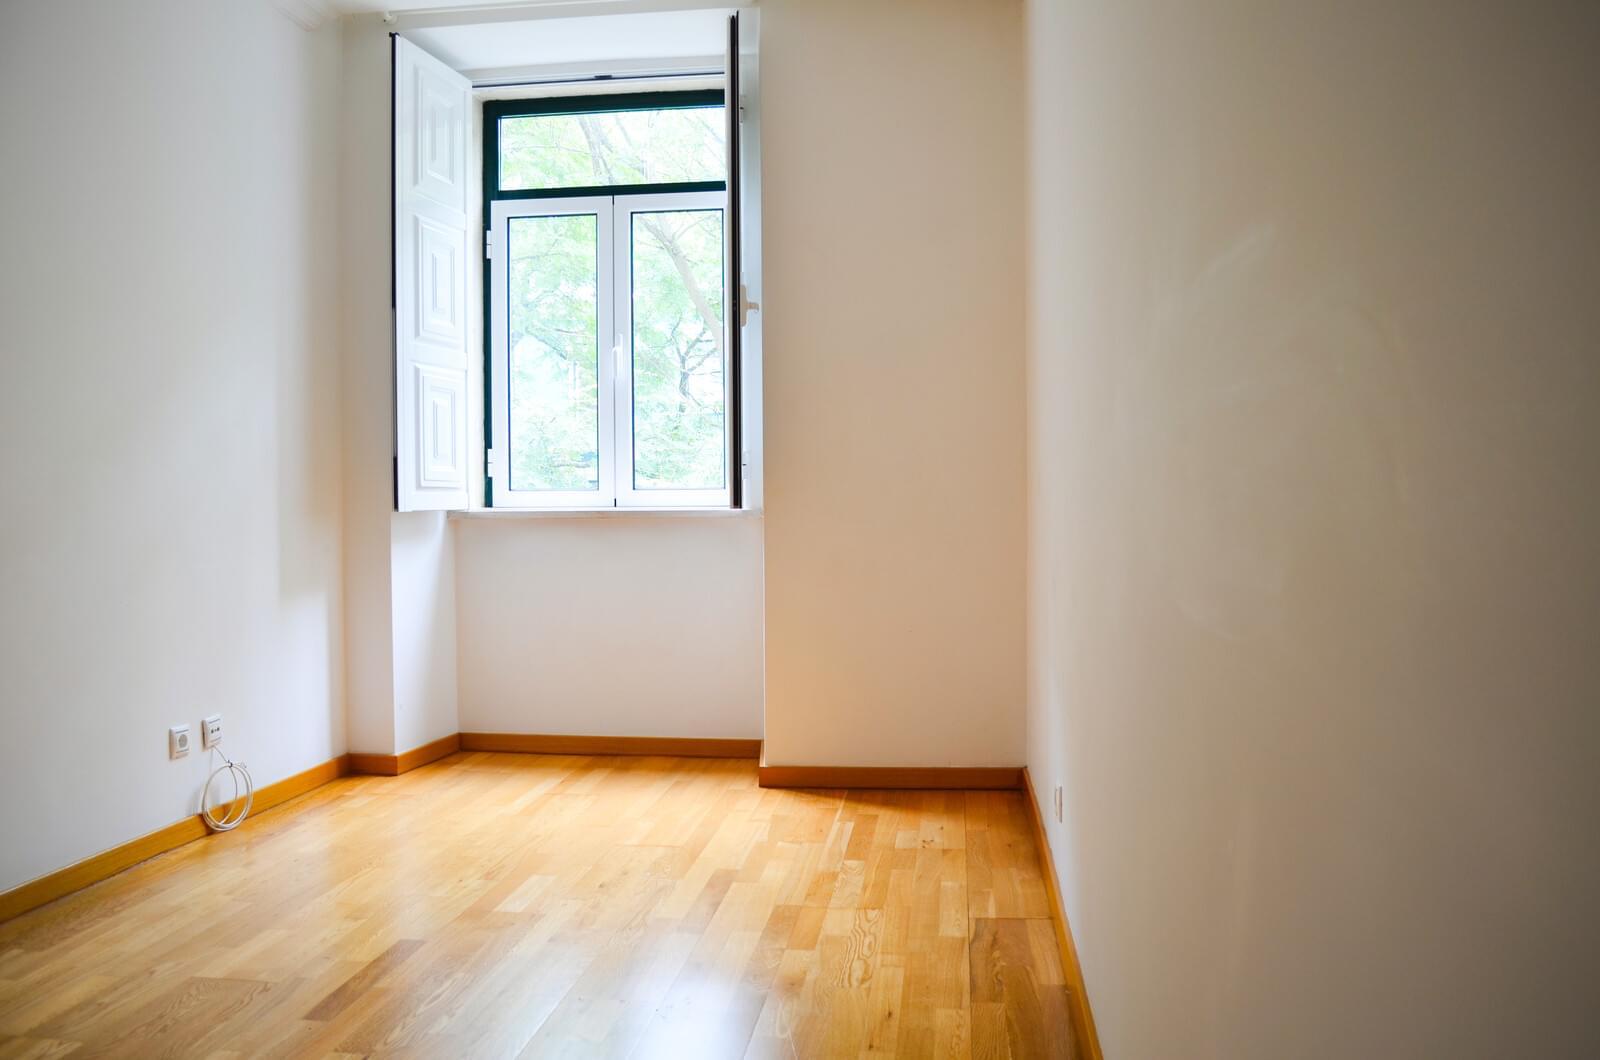 pf18839-apartamento-t2-lisboa-280527f7-34b3-4935-bd64-0135aa5bc1f0